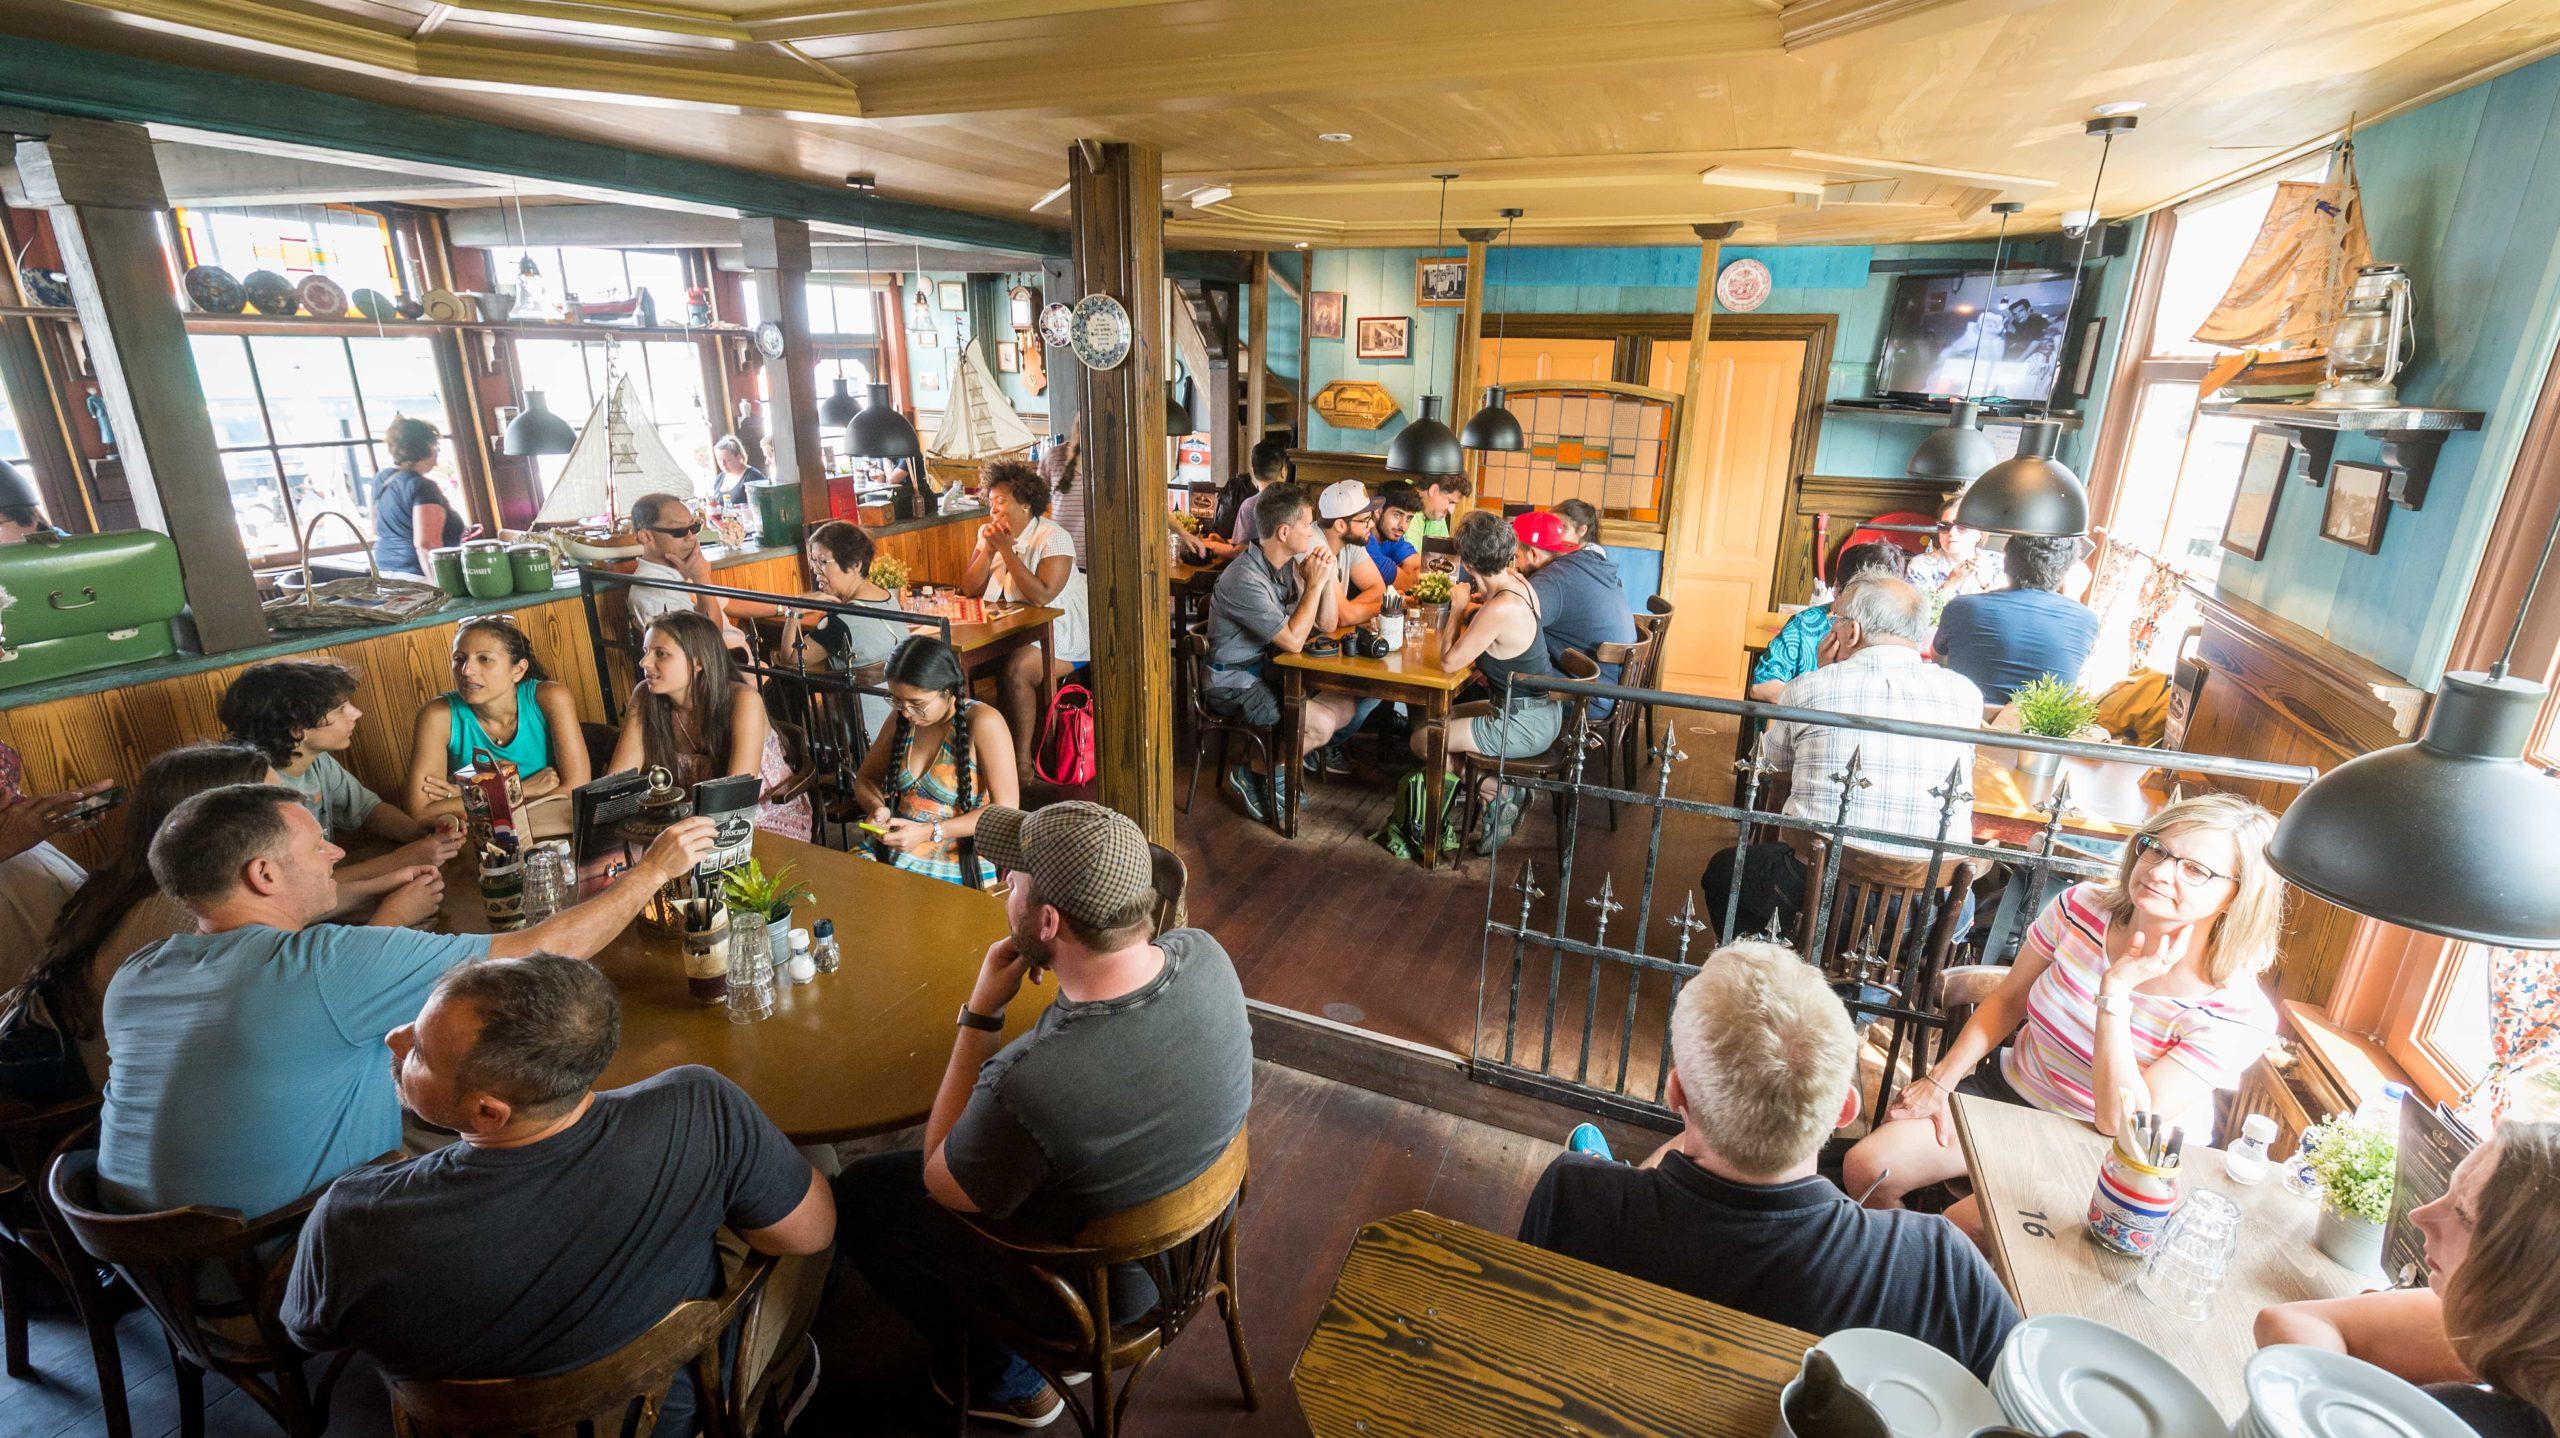 Inrichting Taverne de Visscher